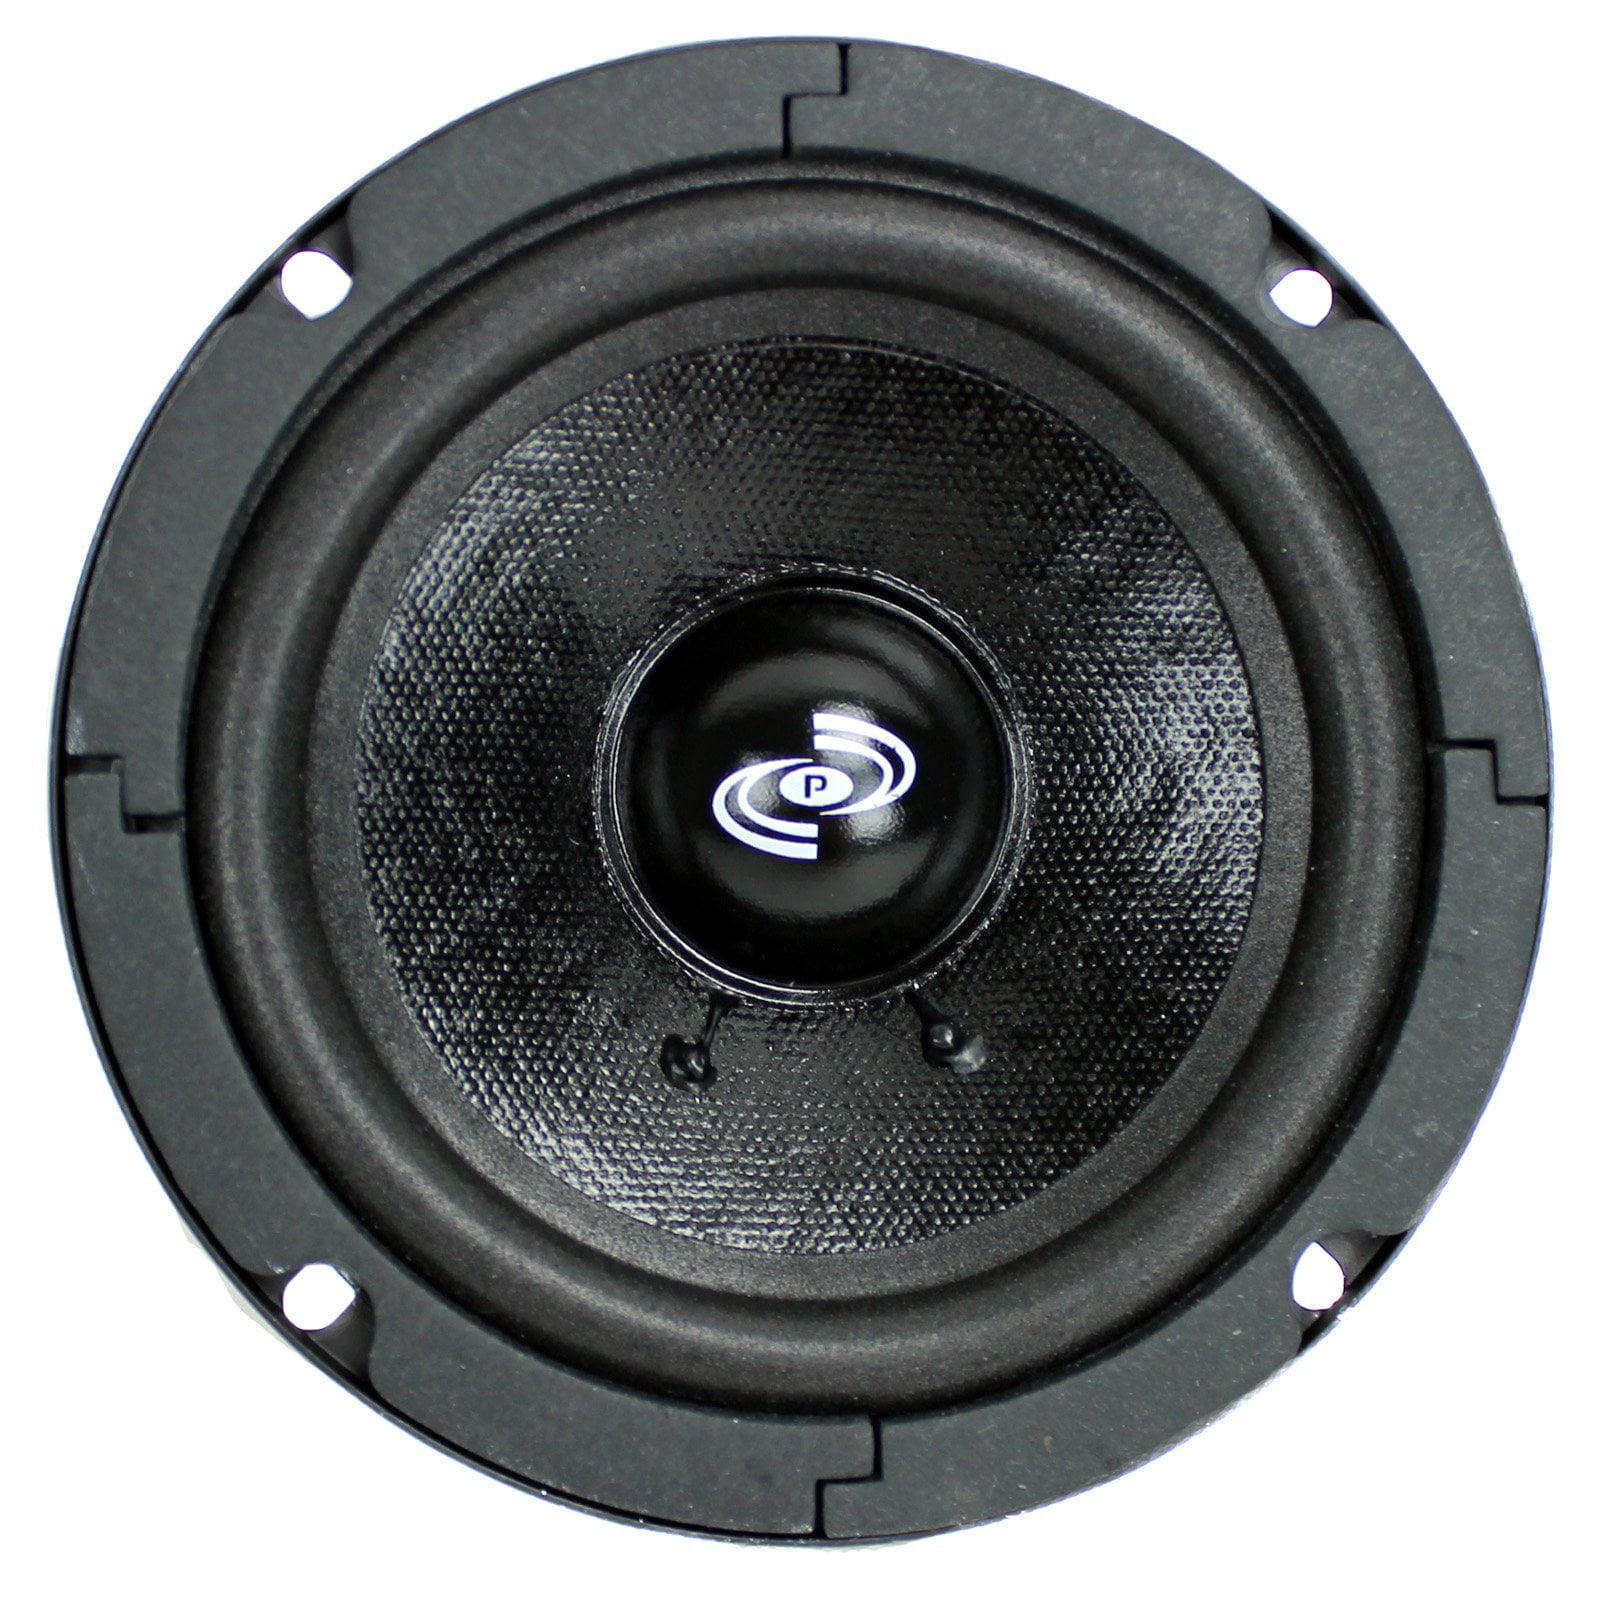 2 PYLE Pro PDMR5 5 400W Car DJ Home Mid Bass MidRange